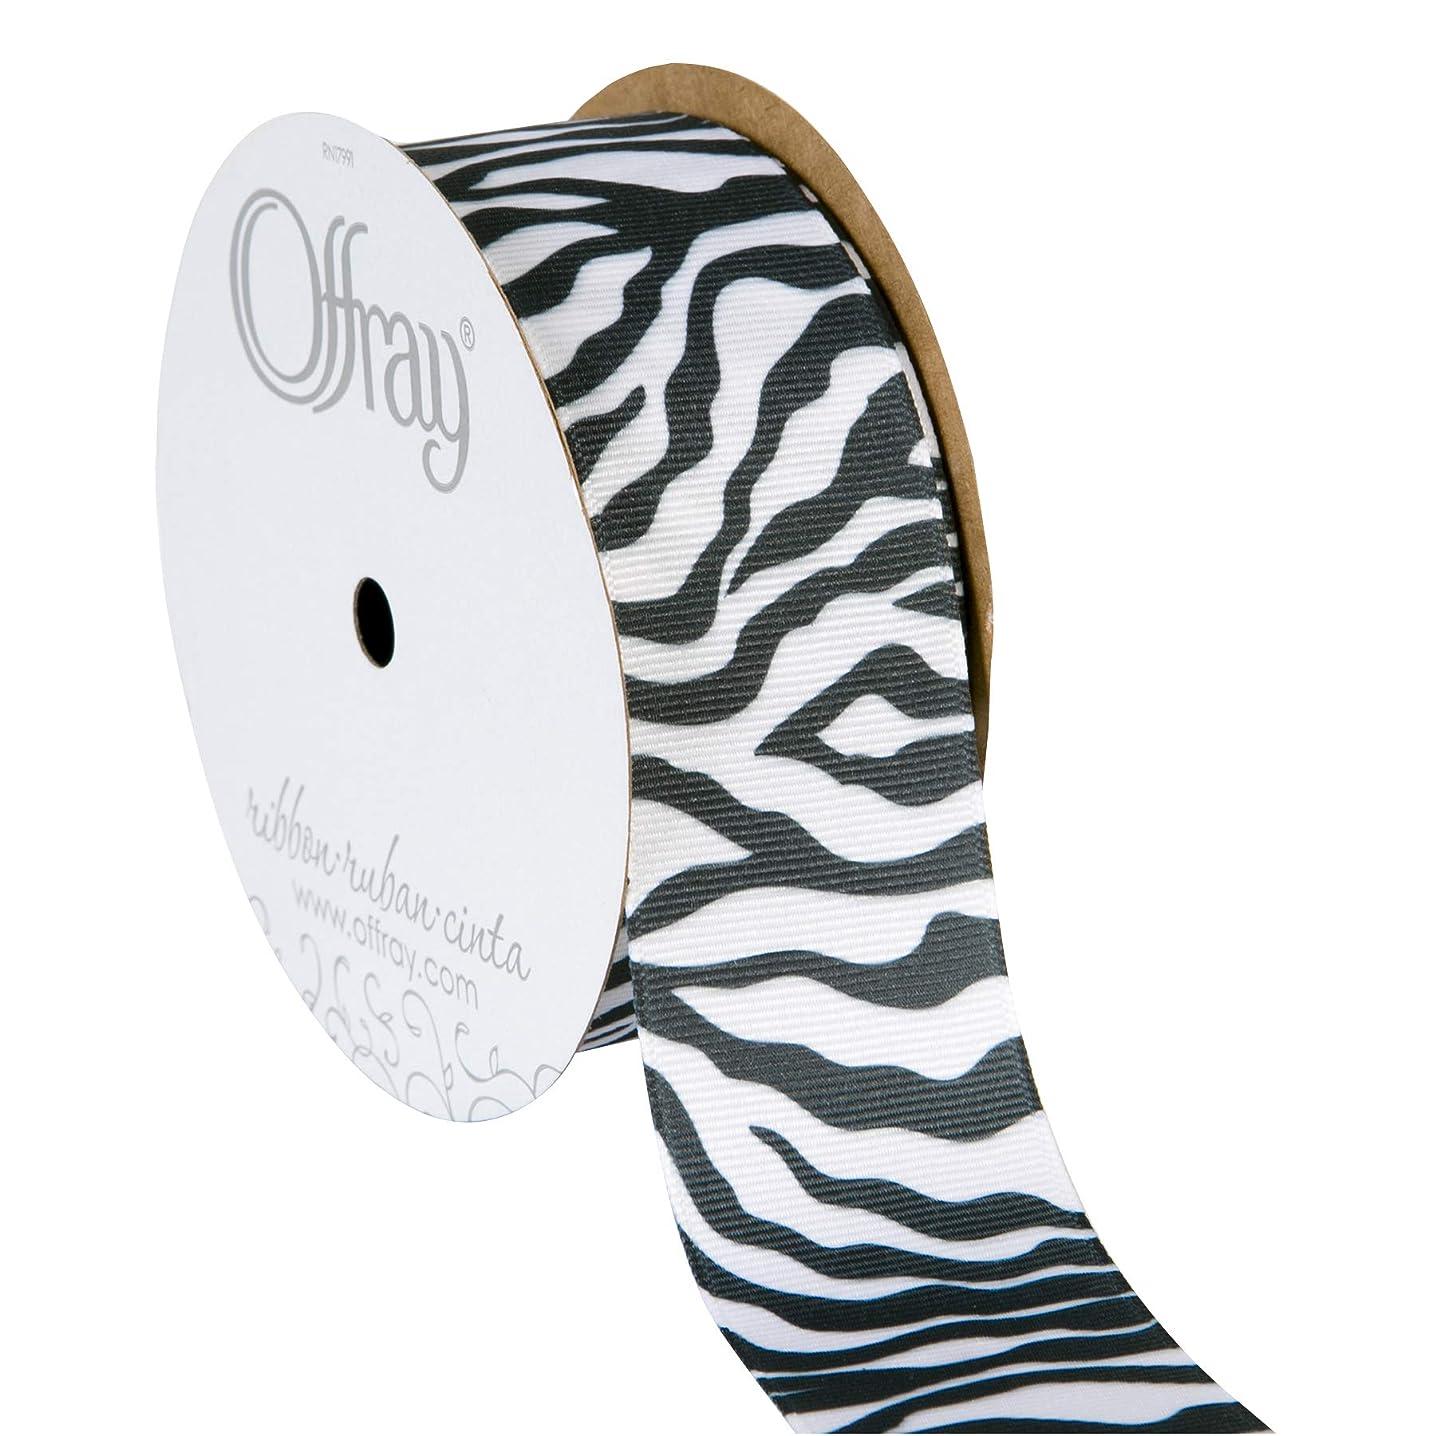 Offray 998809 Zebra Animal Print Grosgrain Craft Ribbon, 1-1/2-Inch Wide by 10-Yard Spool, Black/White